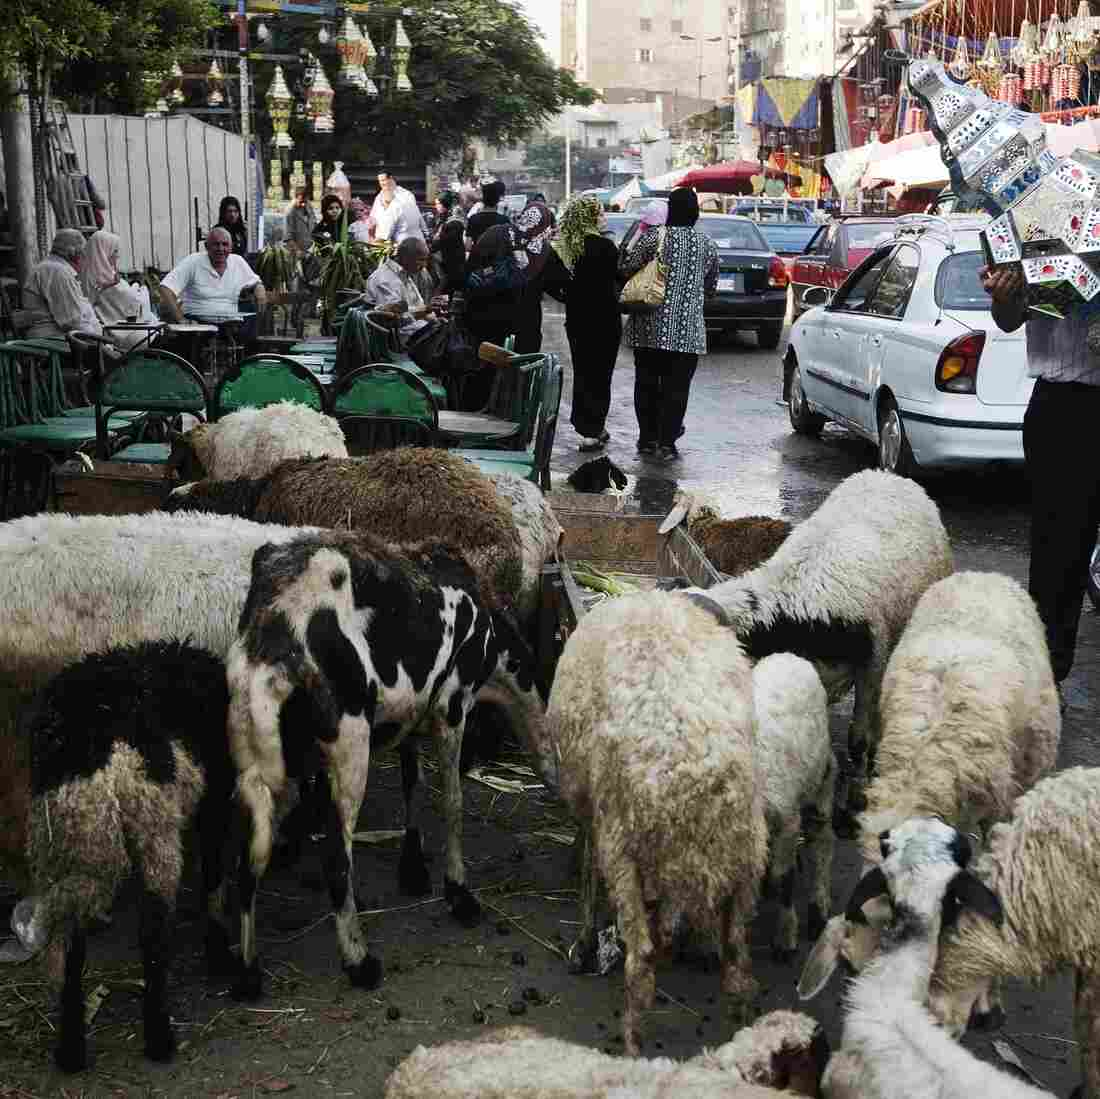 Sheep graze in the street last year in Cairo.